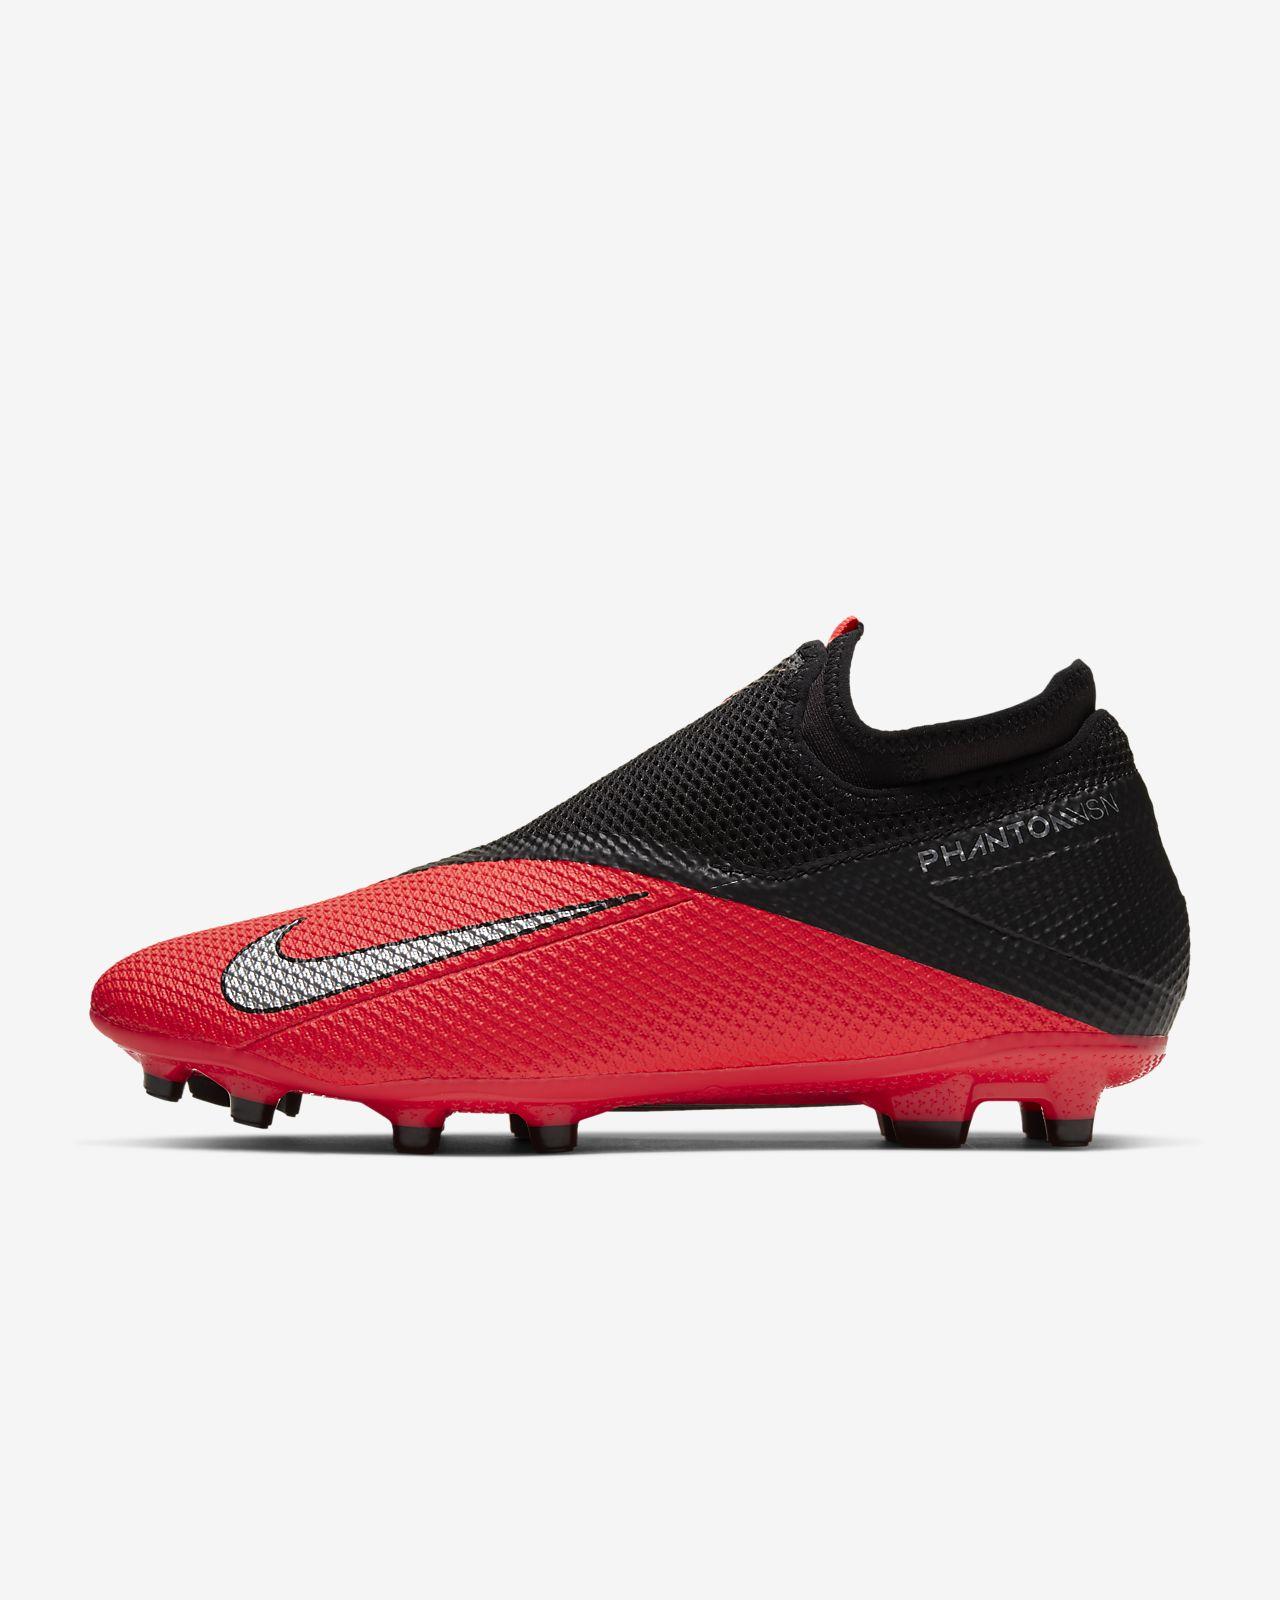 Nike Phantom Vision 2 Academy Dynamic Fit MG 多種場地足球釘鞋